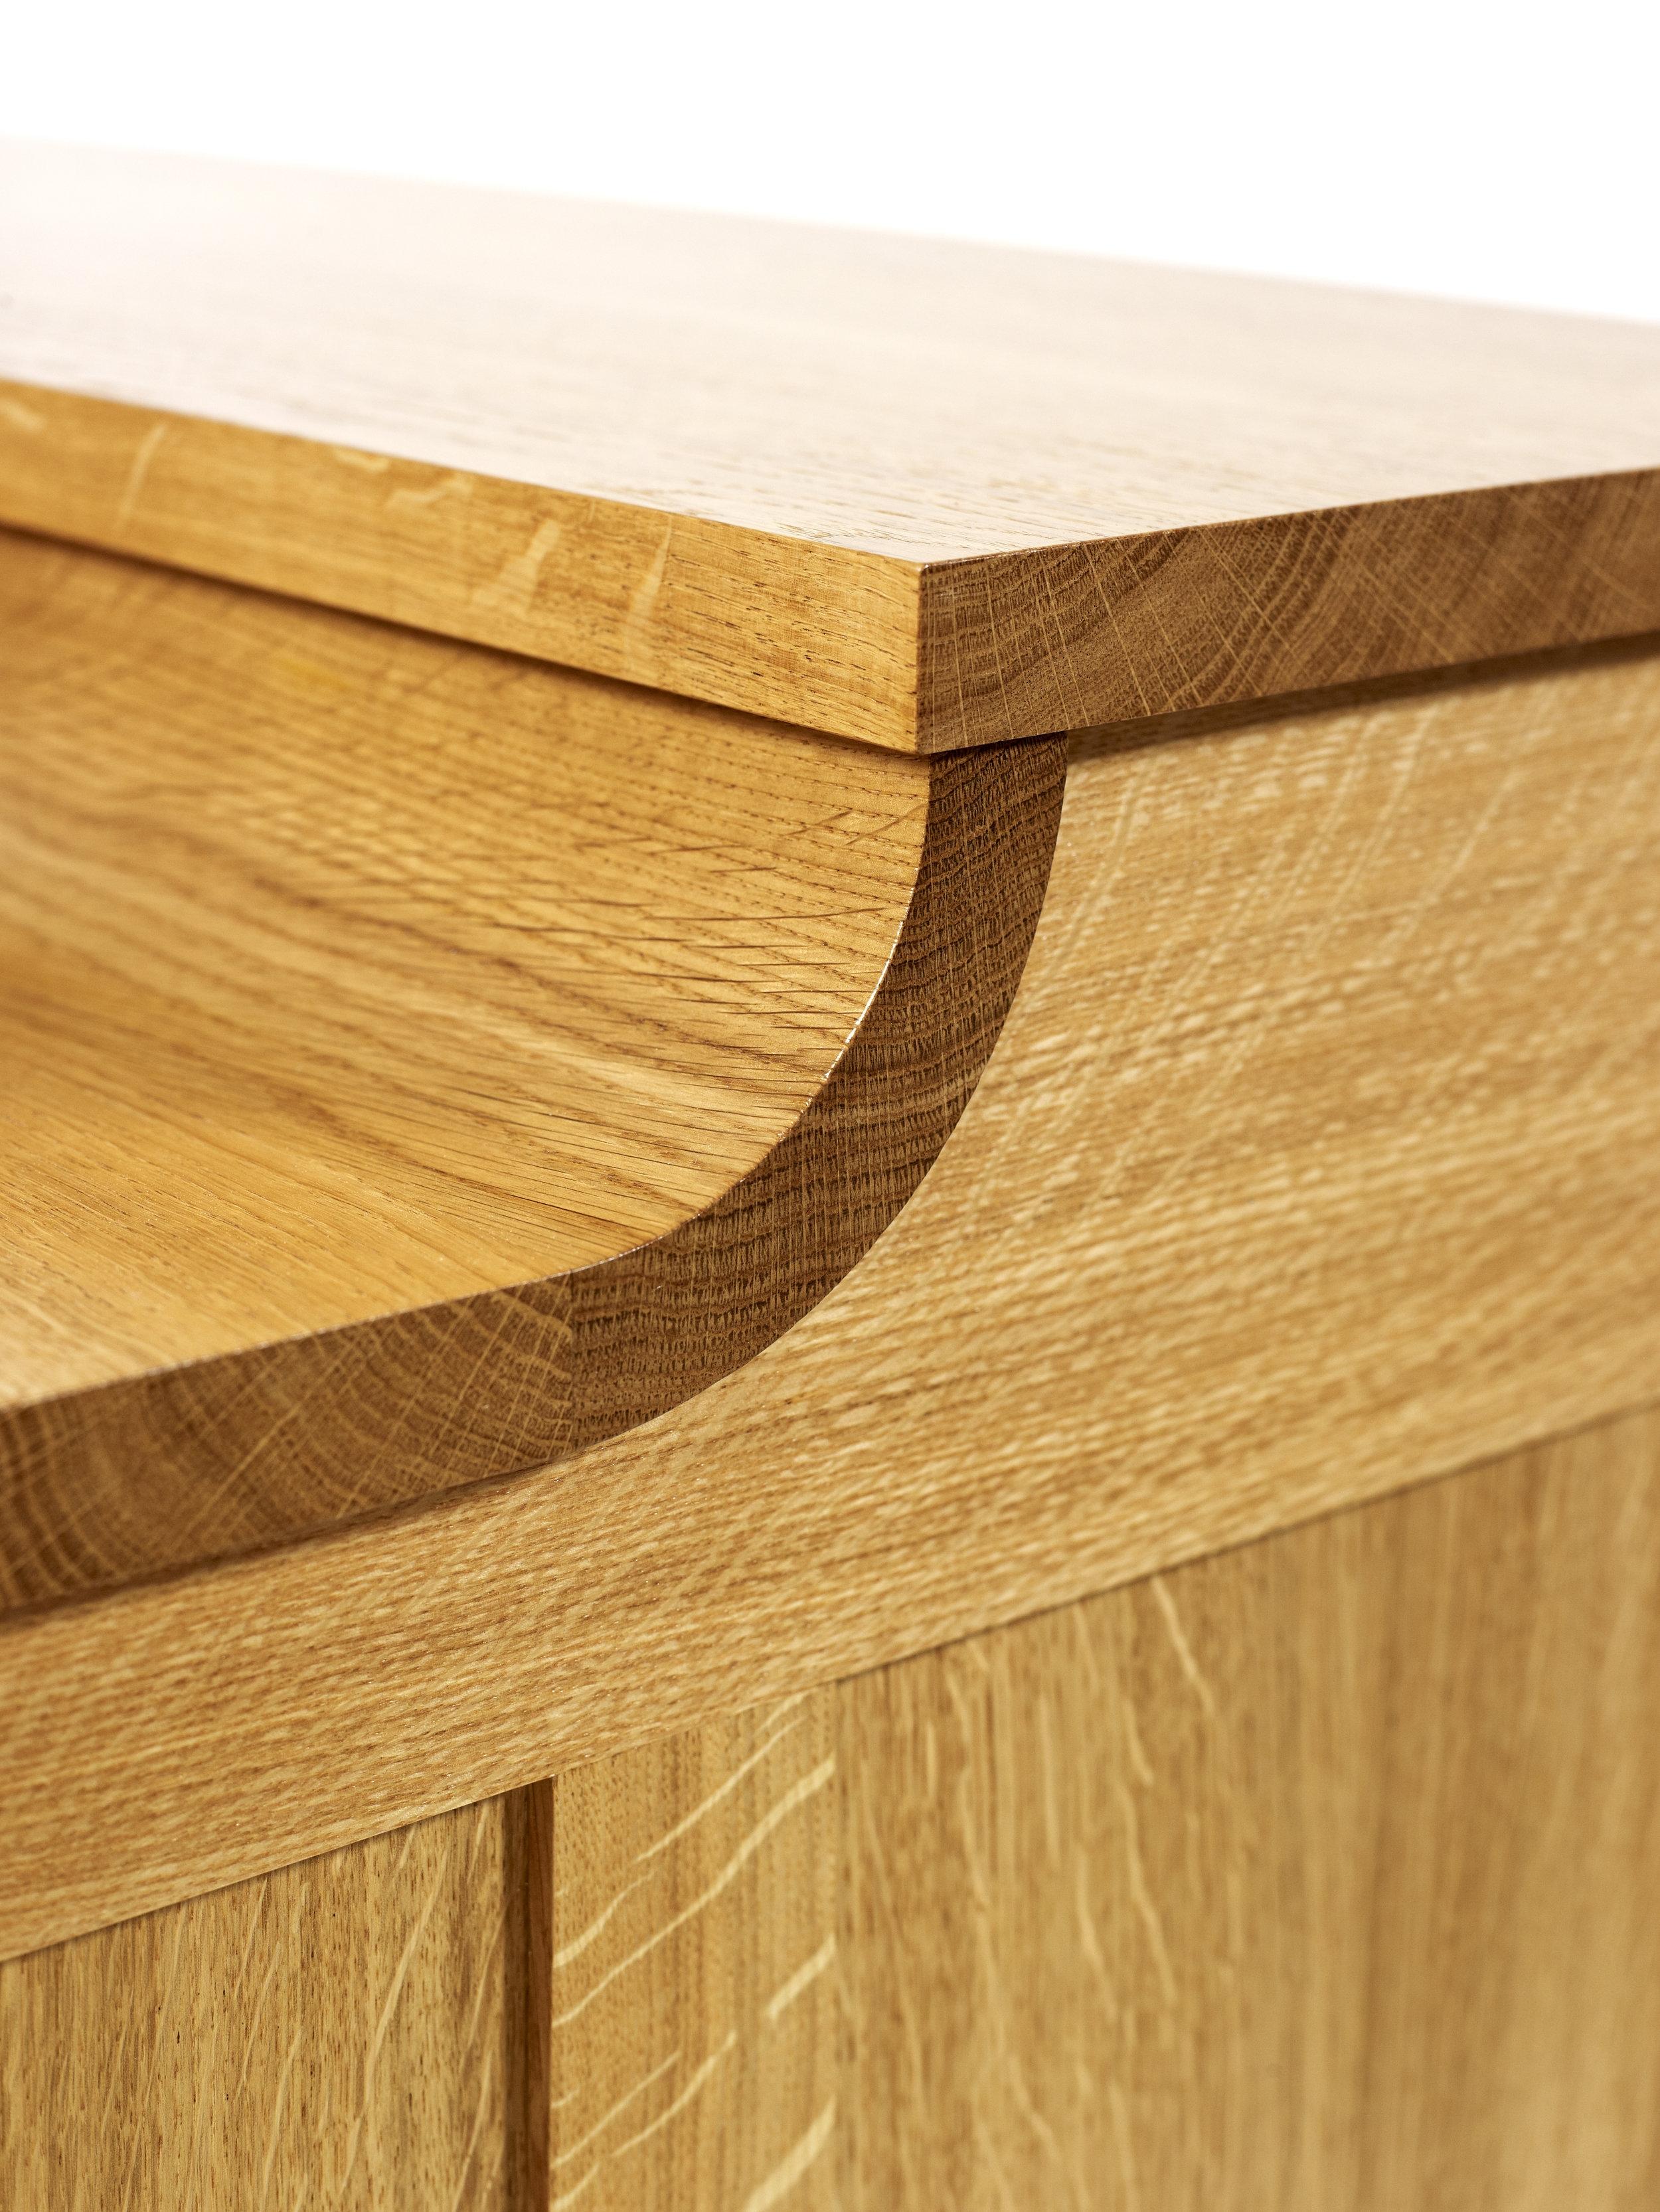 Fink furniture 41224.jpg